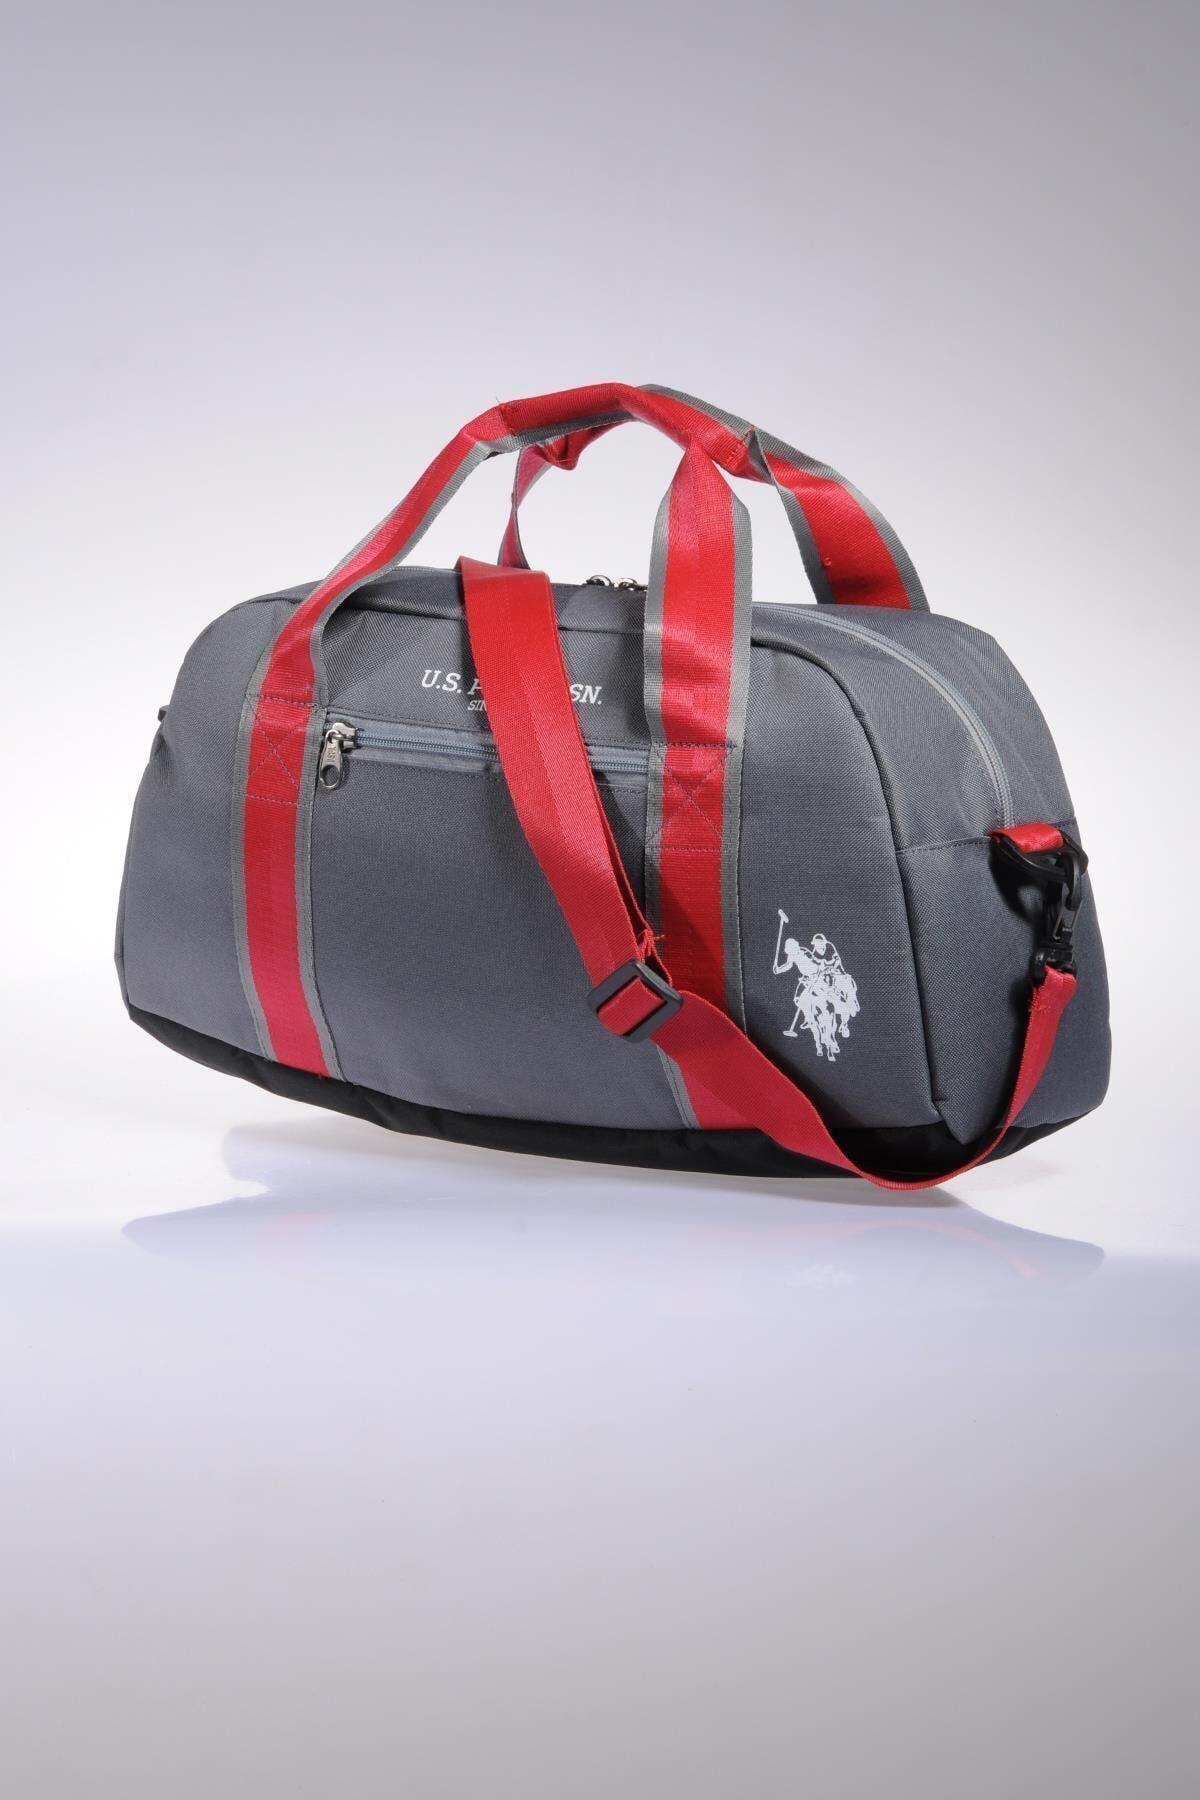 U.S. Polo Assn. Plduf6974 Gri Unısex El Valizi Ve Spor Çantası 1